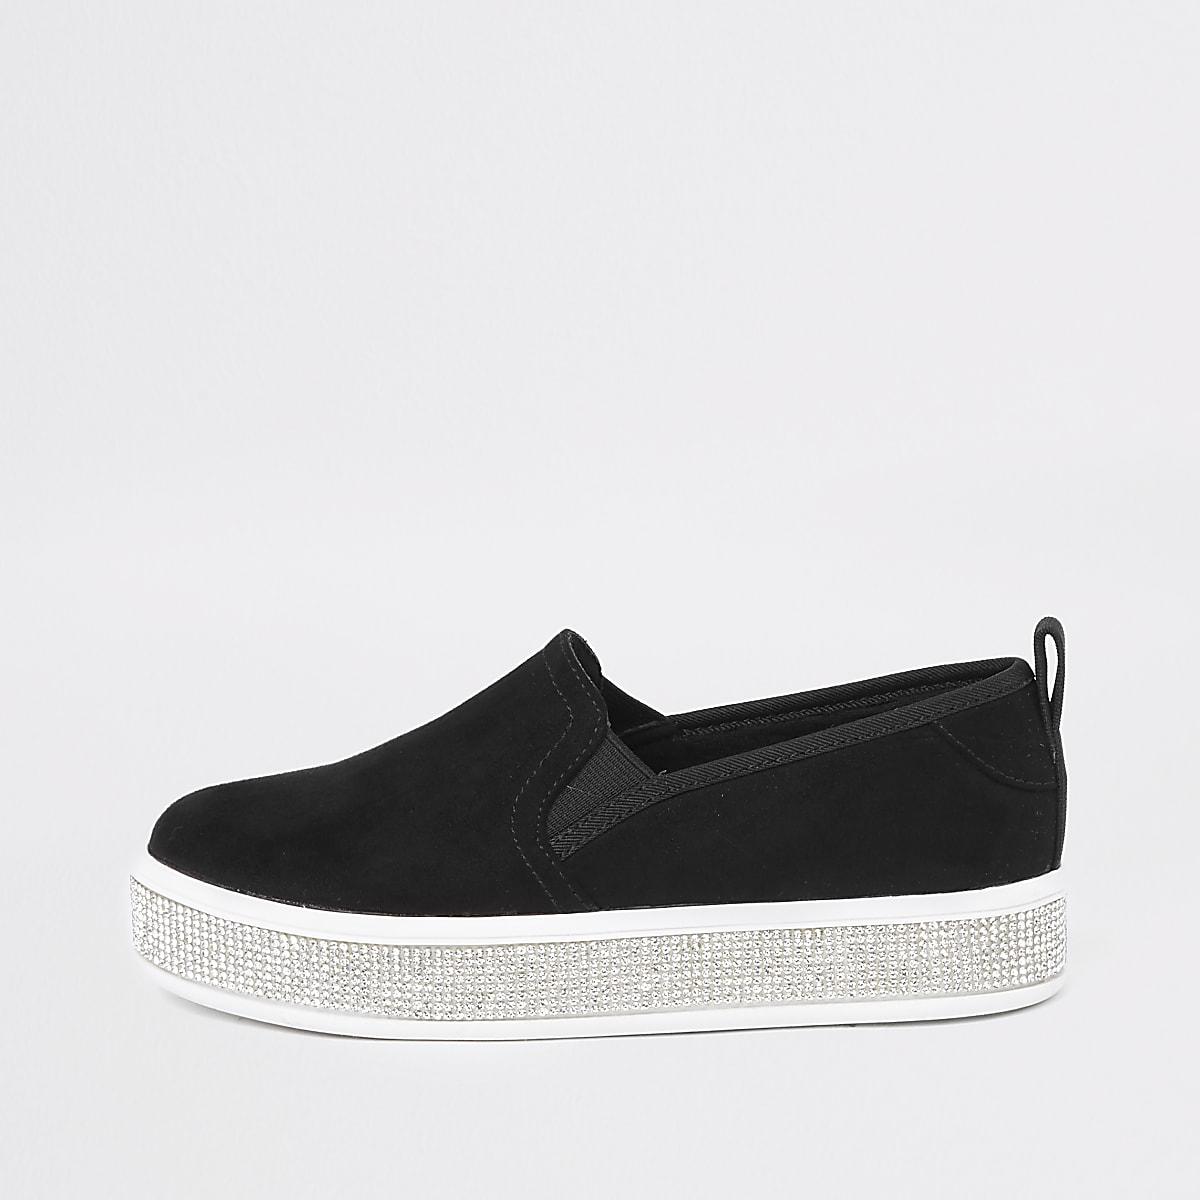 Girls black rhinestone sole plimsolls